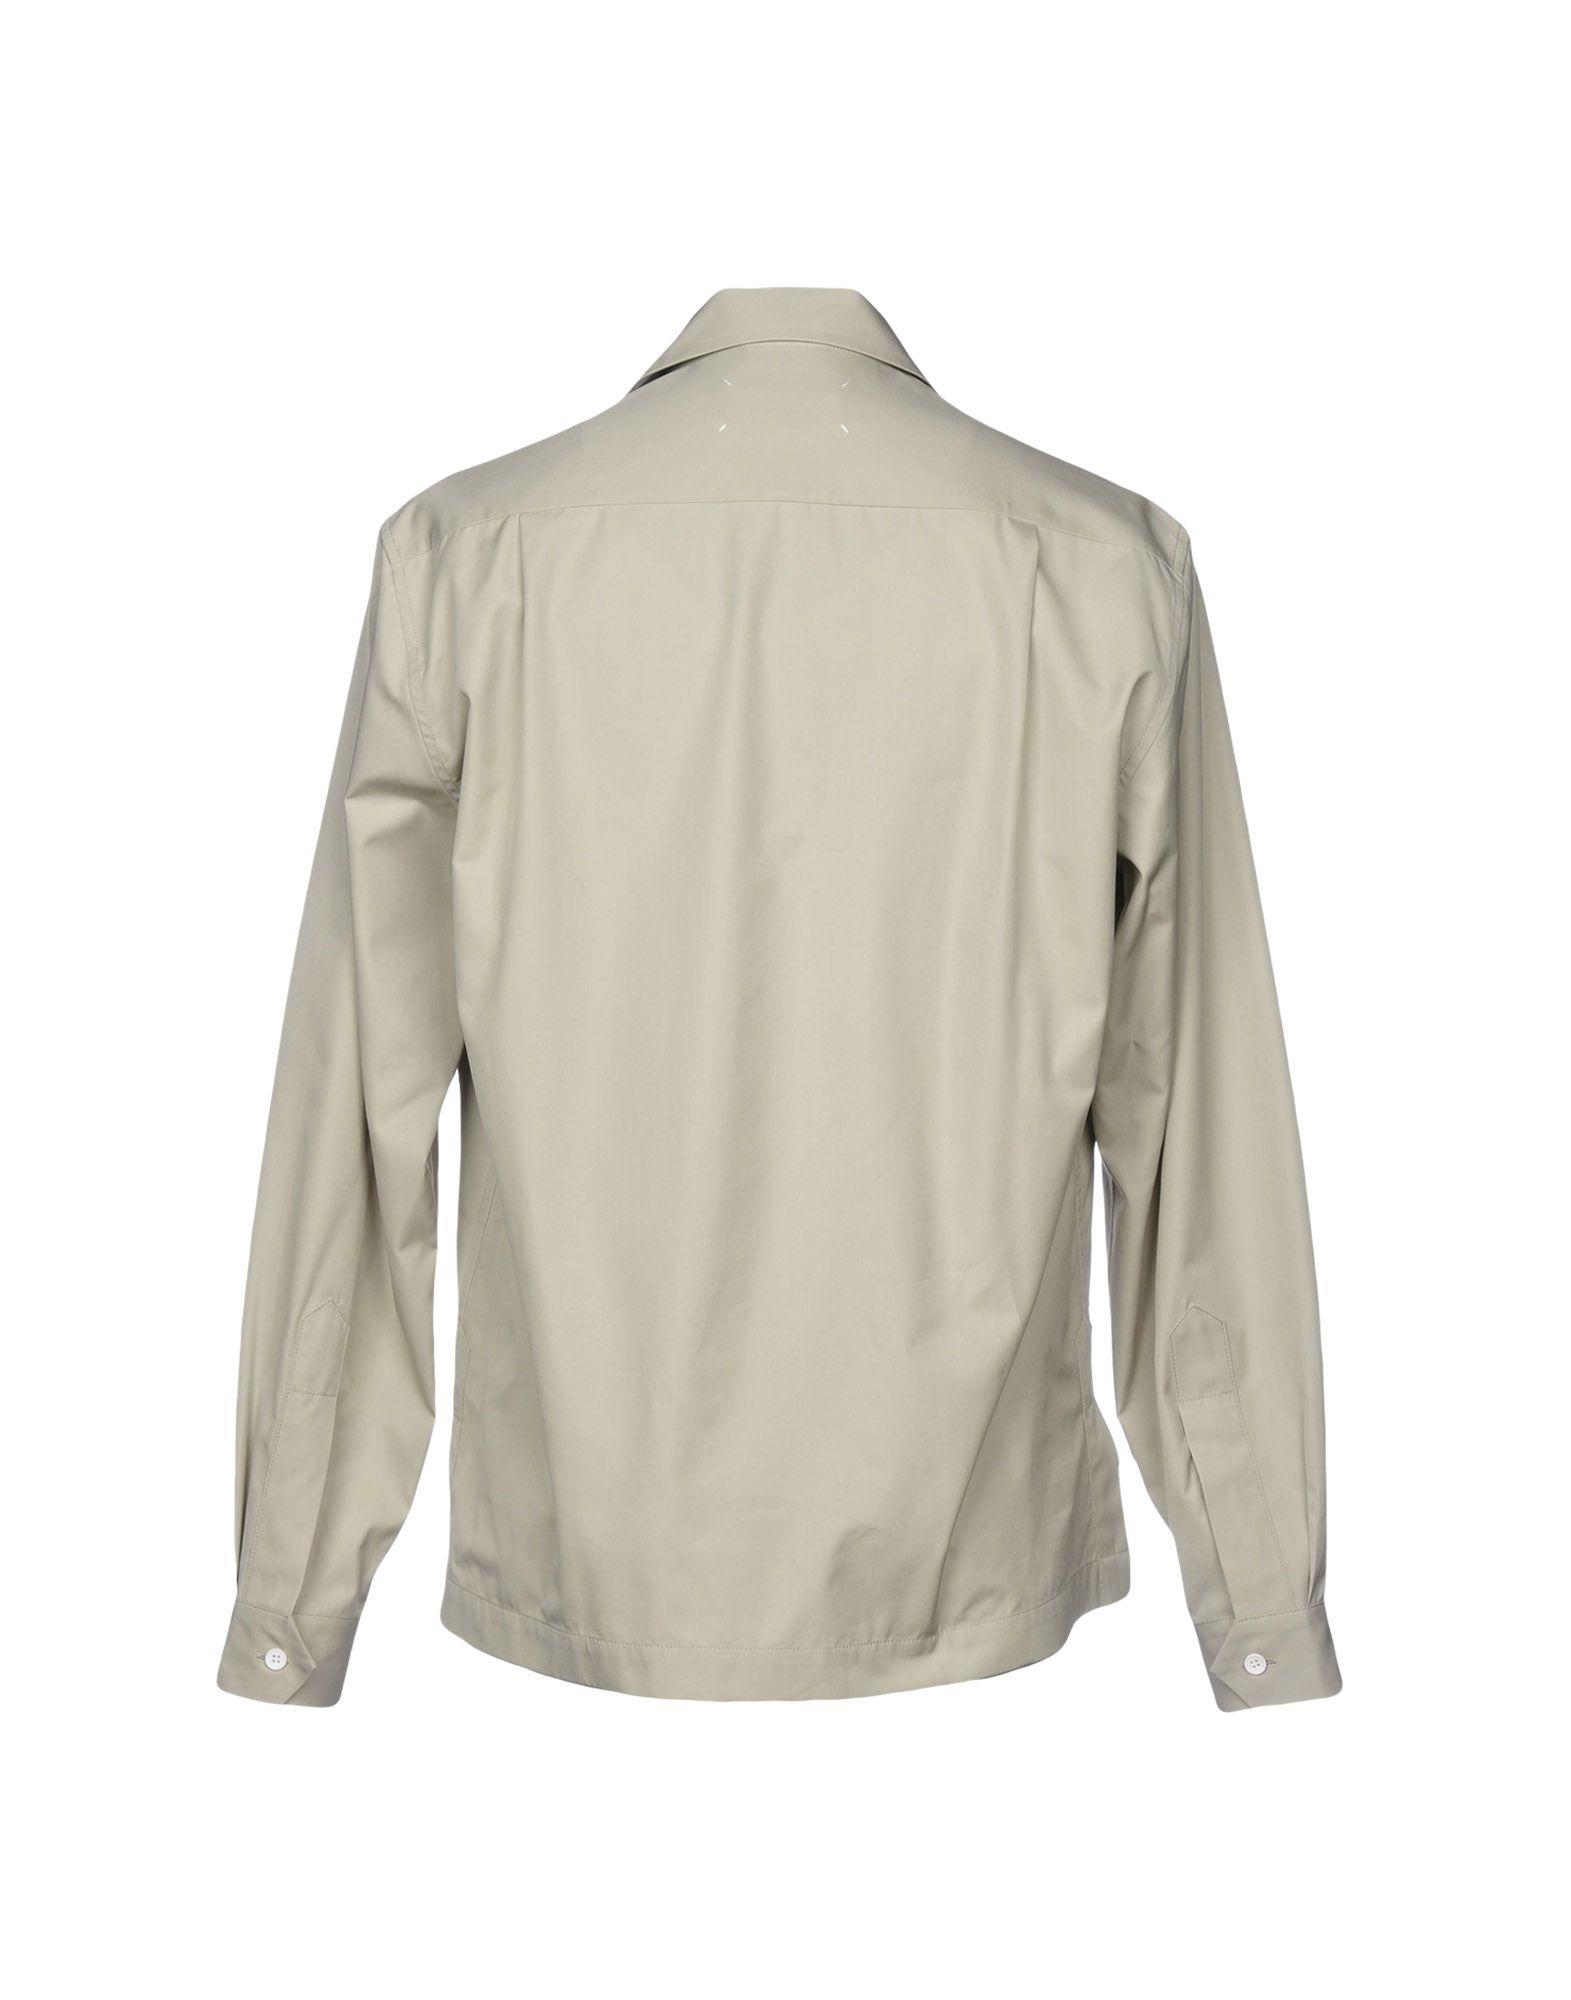 Camicia Tinta Margiela Unita Maison Margiela Tinta Uomo - 38745218XG 38a2ca